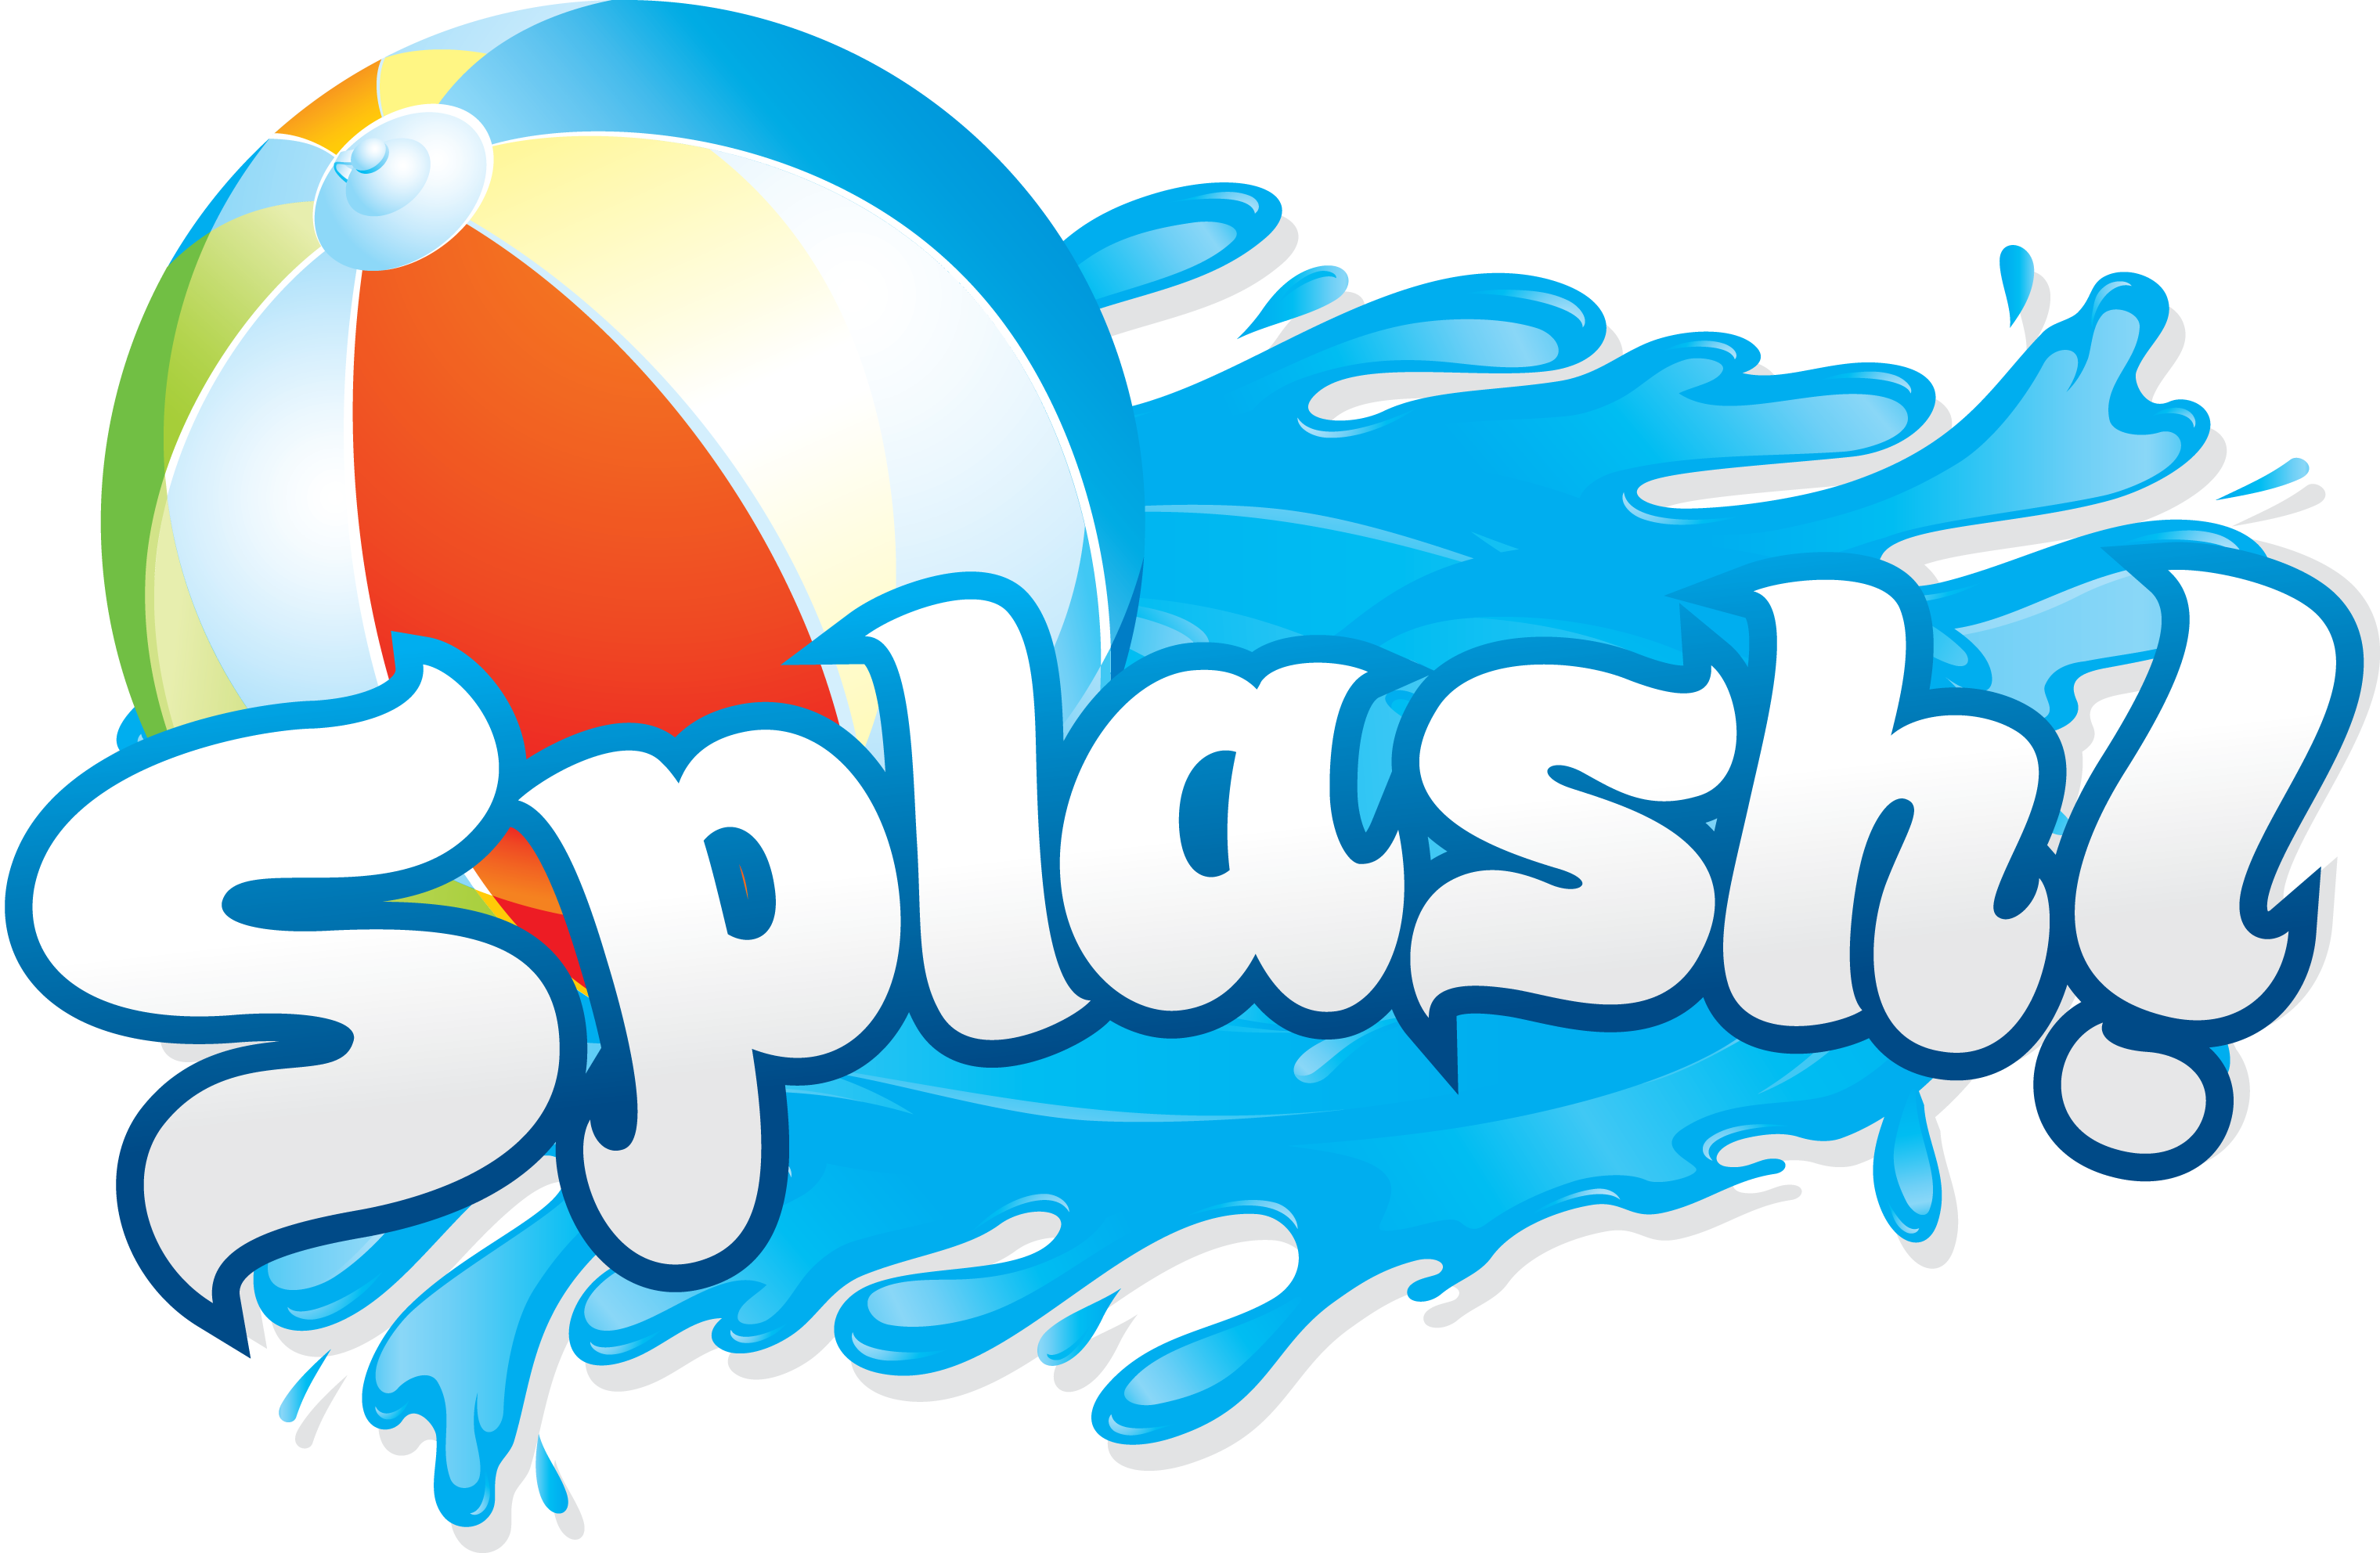 water splash silhouette at getdrawings com free for personal use rh getdrawings com Splash Pad Clip Art Black and White splash park clipart